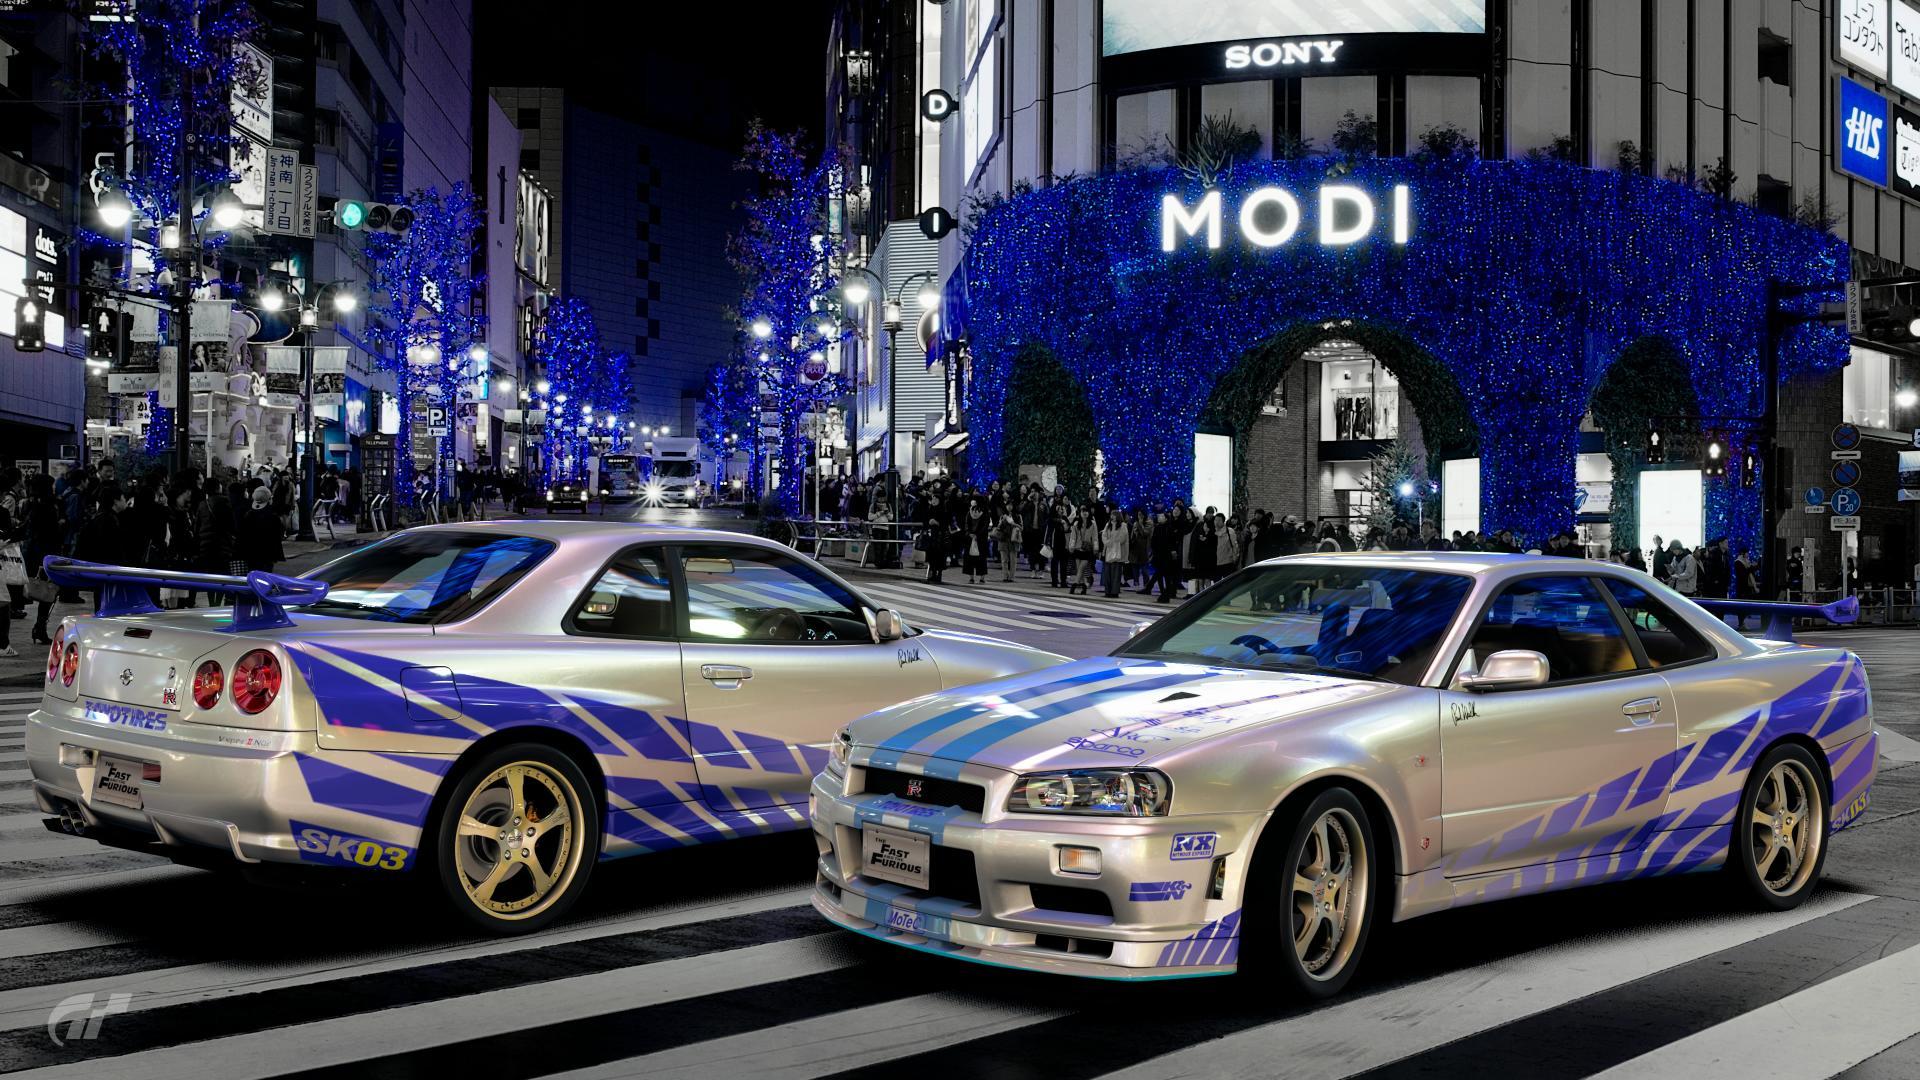 Skyline GT R VムSpec II Nür R34 Scapes S By Sakooo3